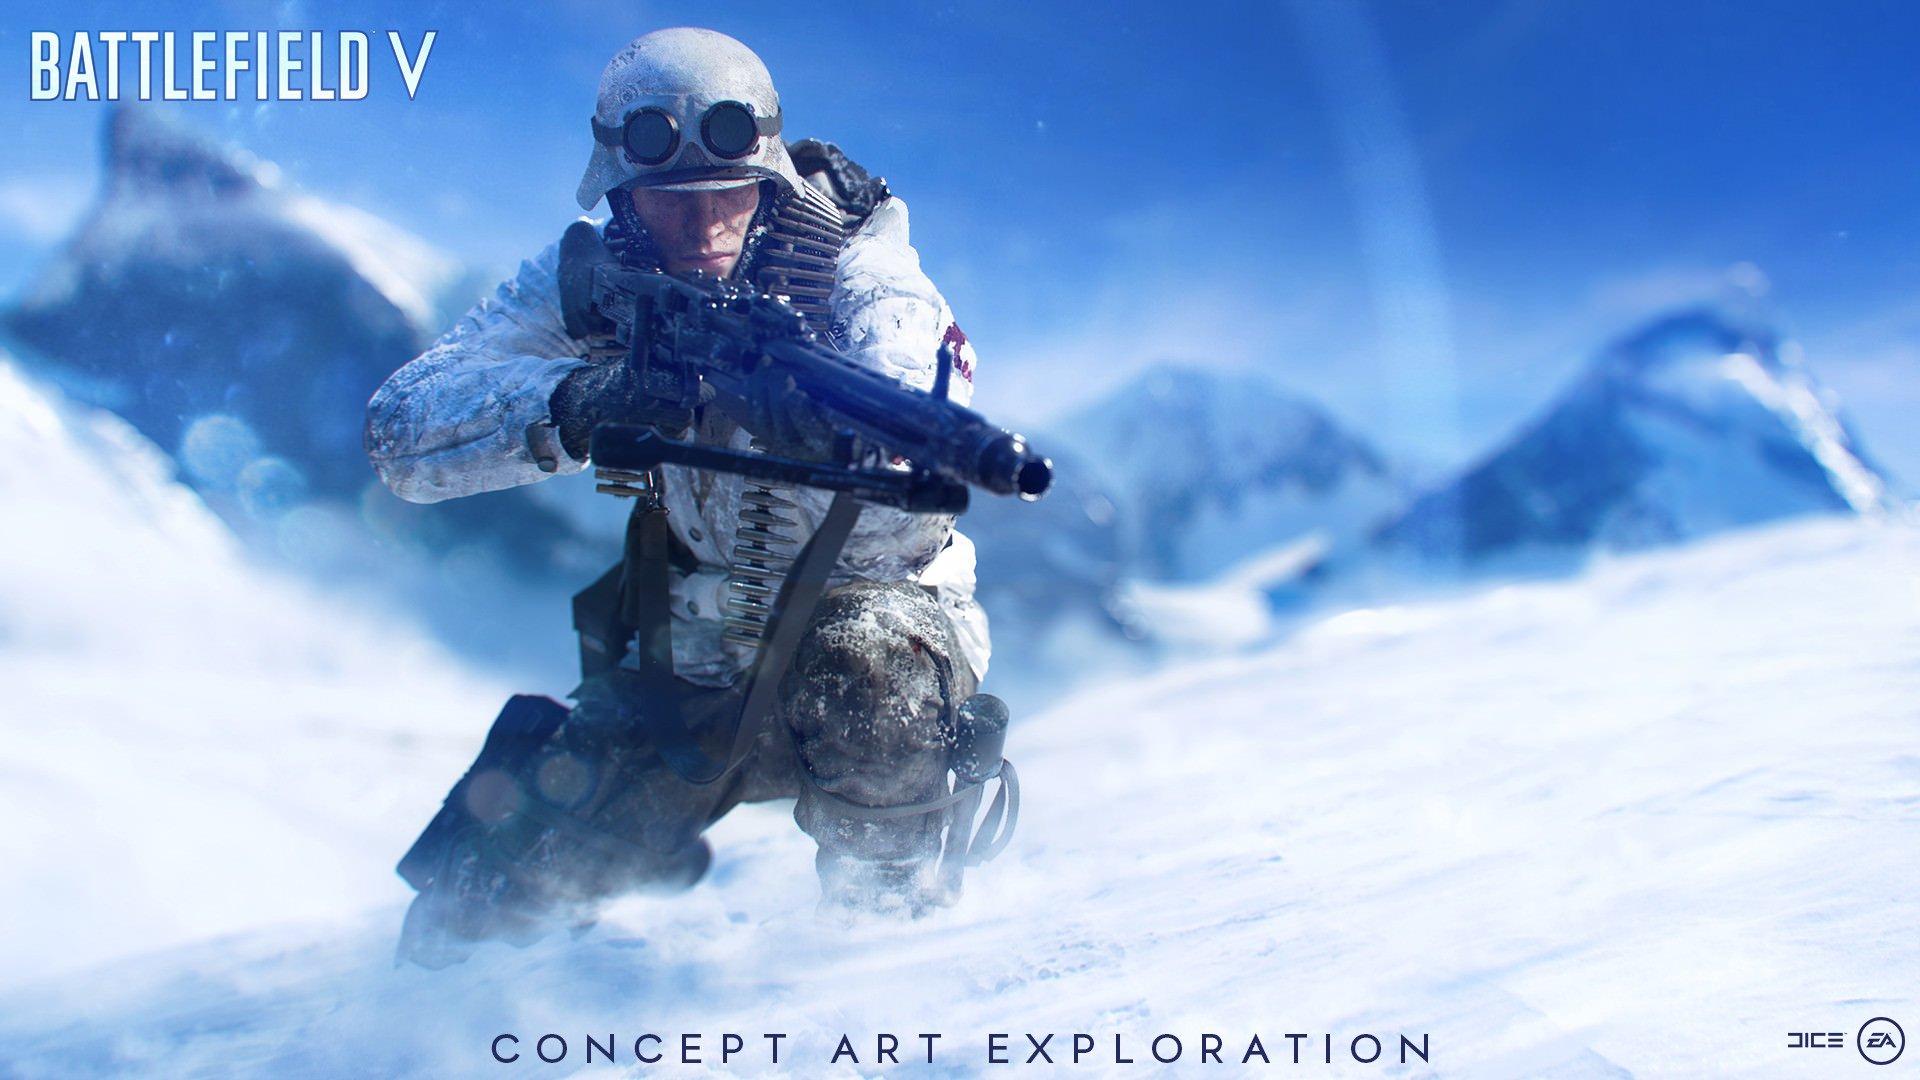 Battlefield v hd wallpapers backgrounds read games - Battlefield v concept art wallpaper ...